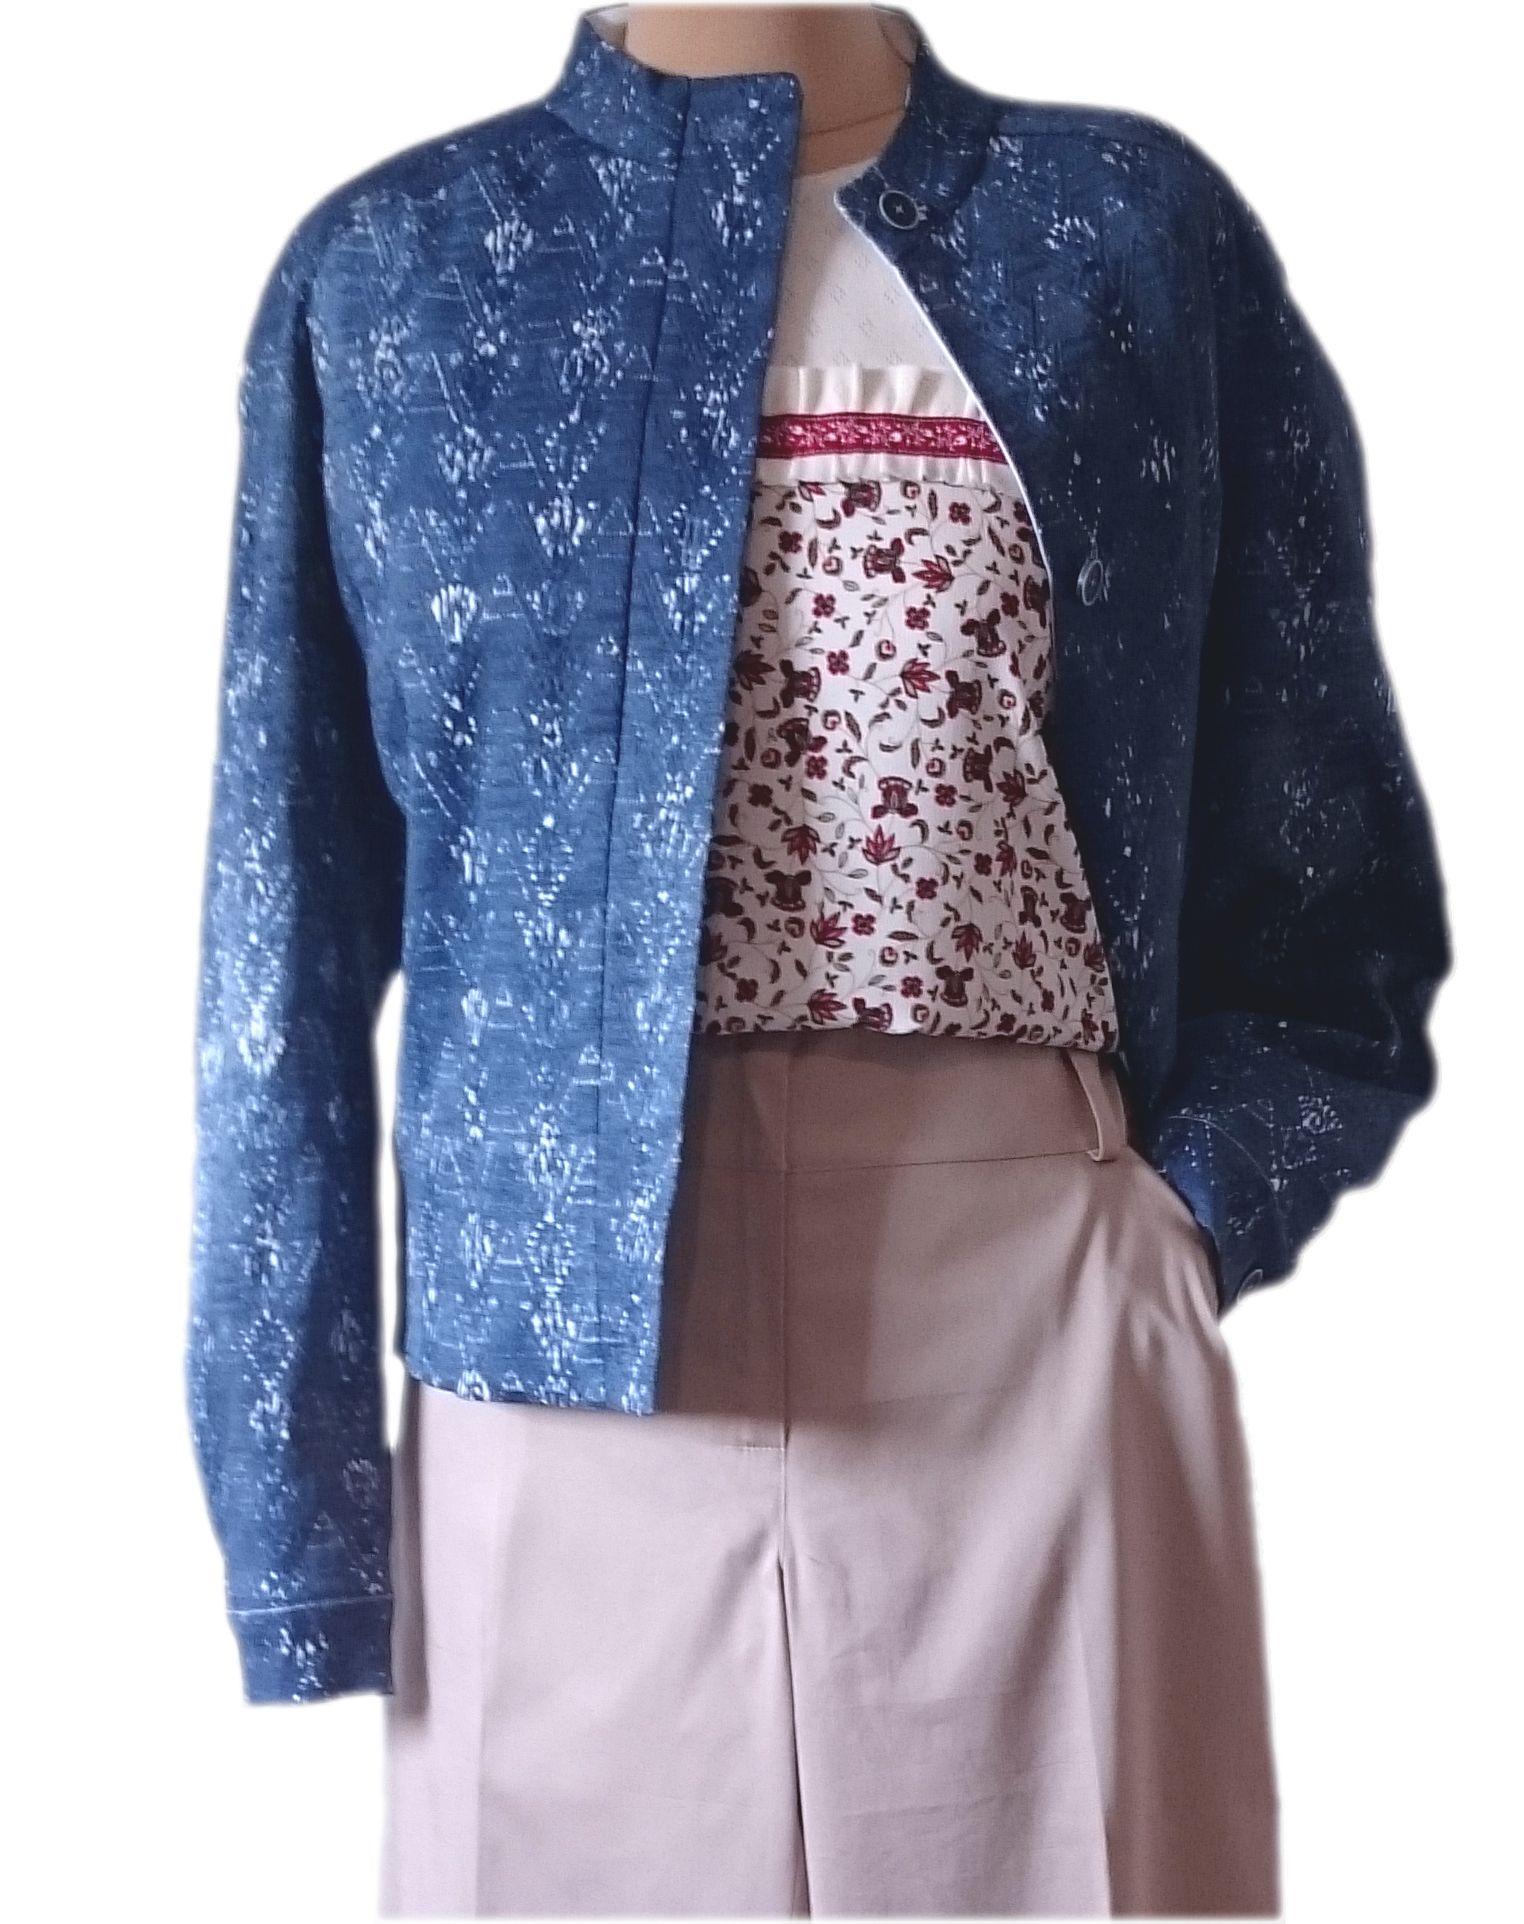 Jacket Blouson Summer In JacketDenim 2019 wk0PX8On